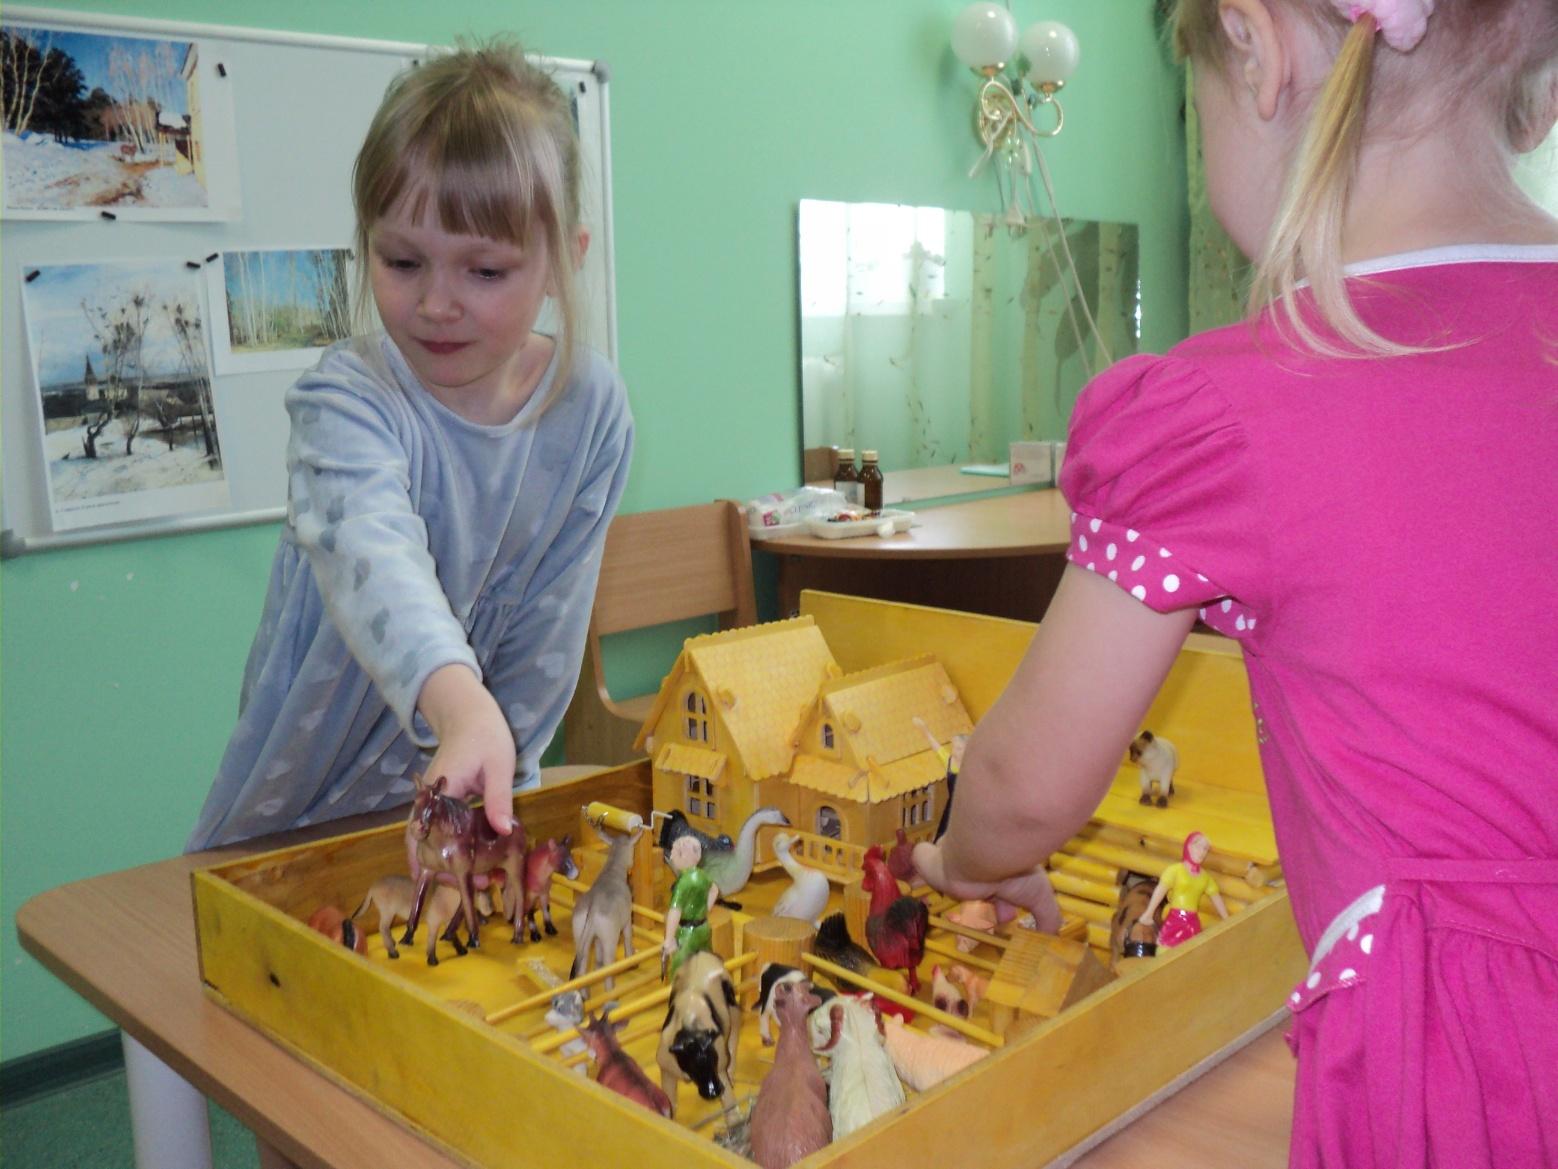 E:\Детскский сад фото\Фото для проекта\DSC01117.JPG